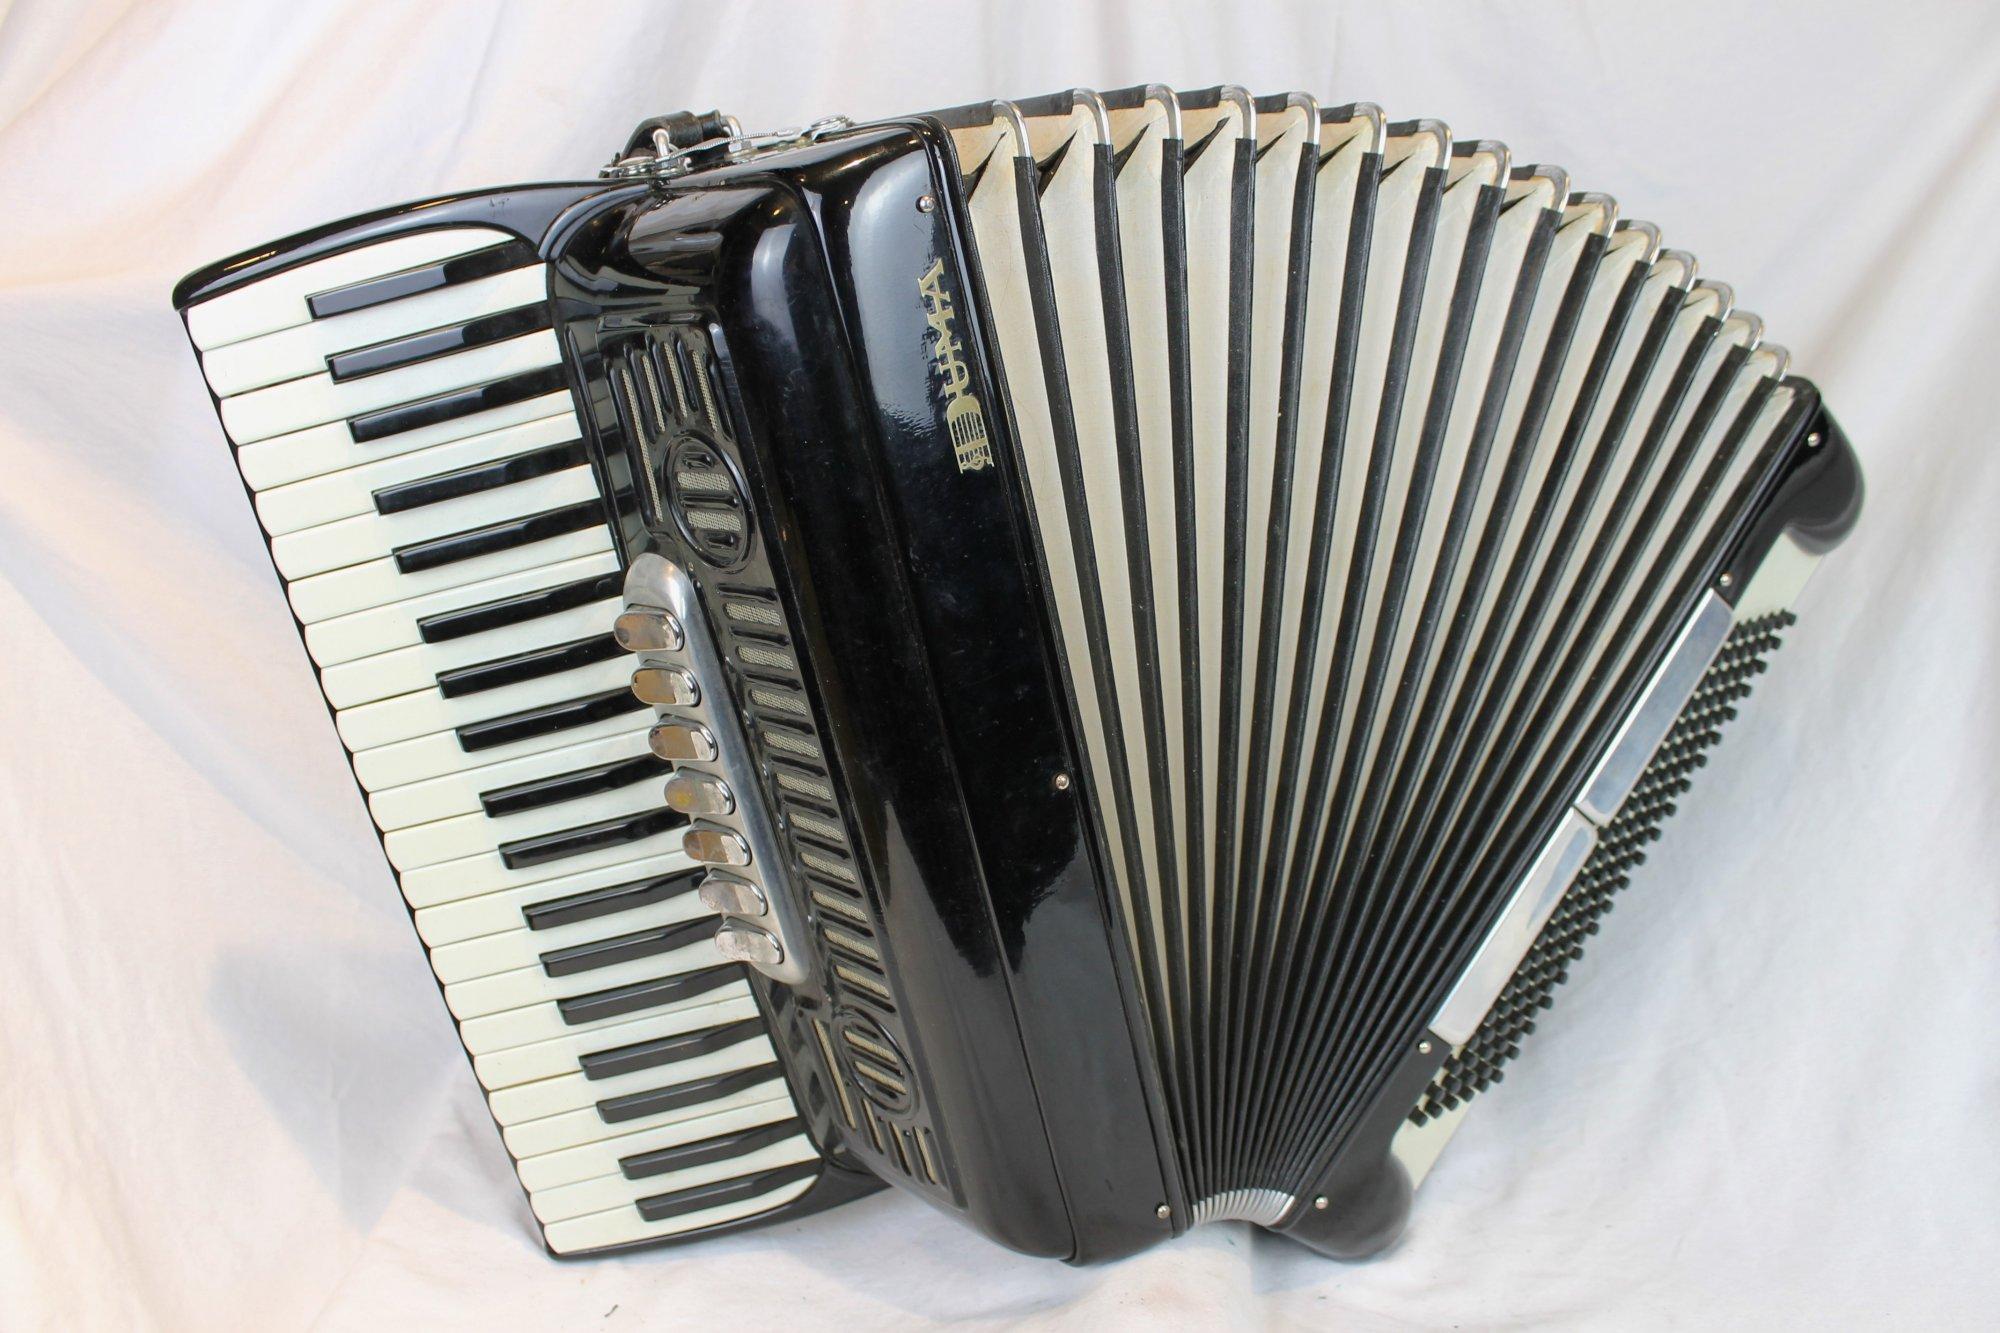 3868 - Black Pancordion Duma Piano Accordion LMH 41 120